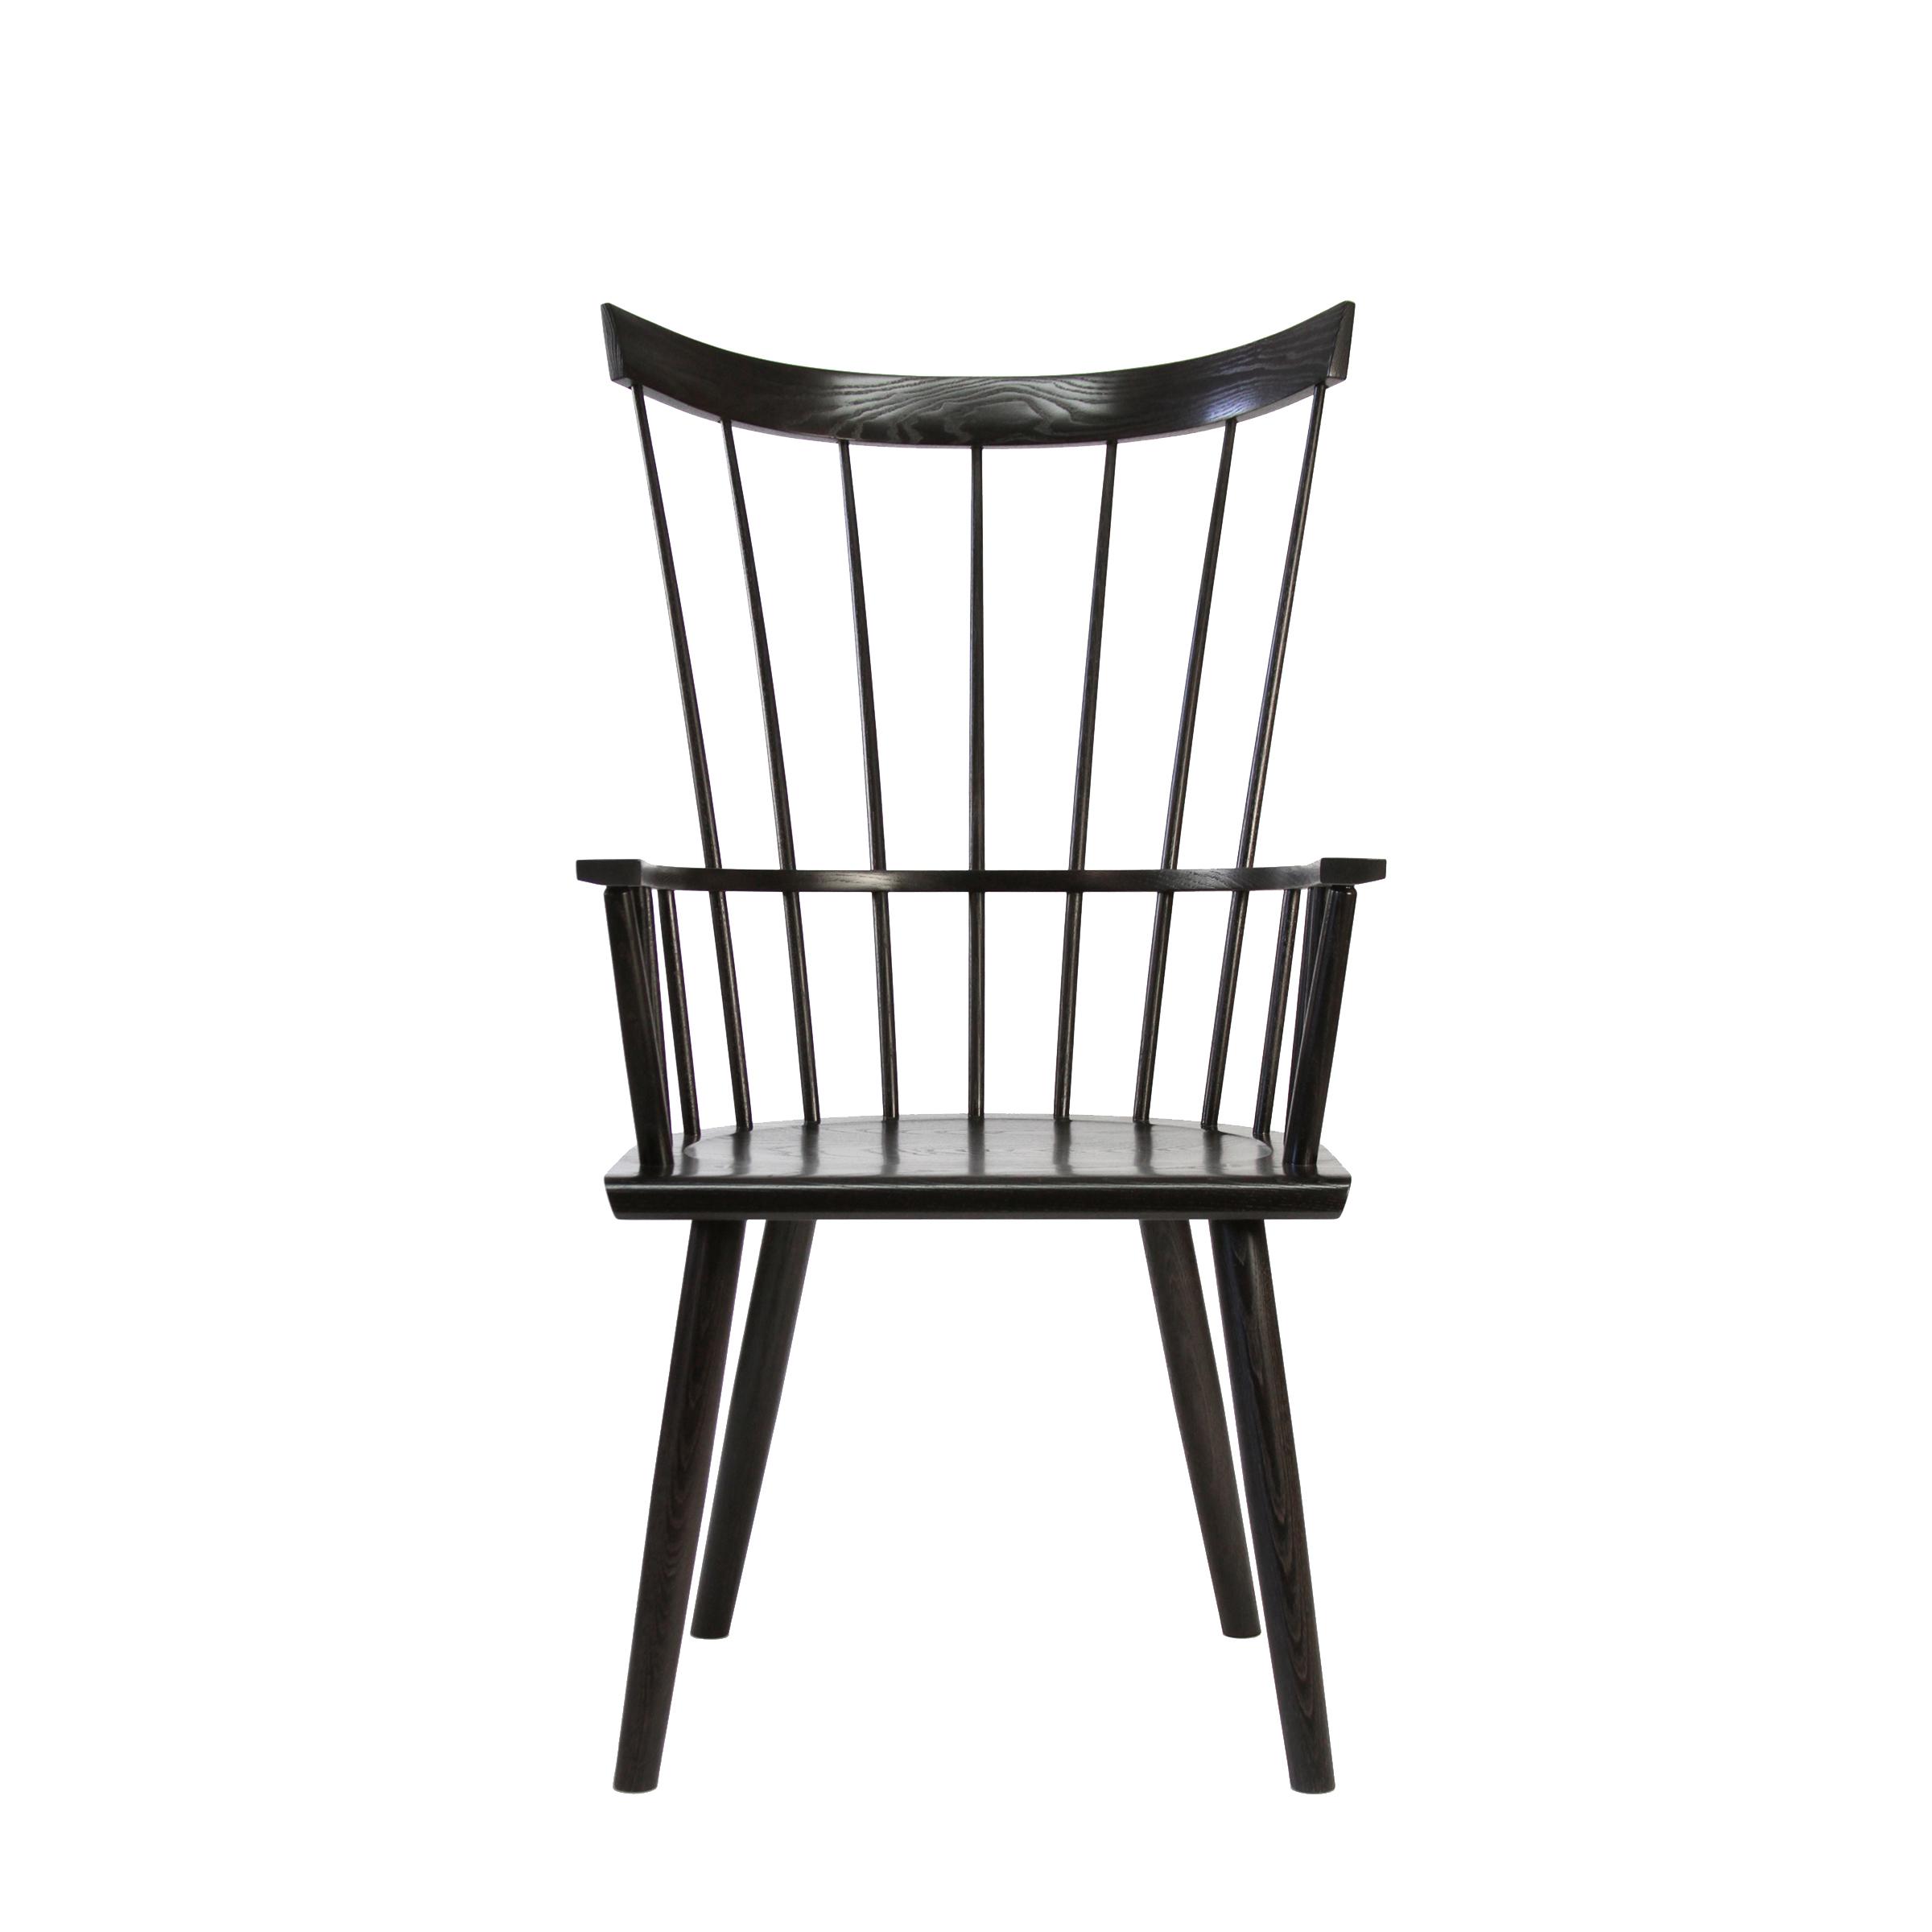 O&G Studio Colt High Back Highback Windsor Contemporary Dining Chair Armchair Large Beet Dark Burgundy Stain on Ash